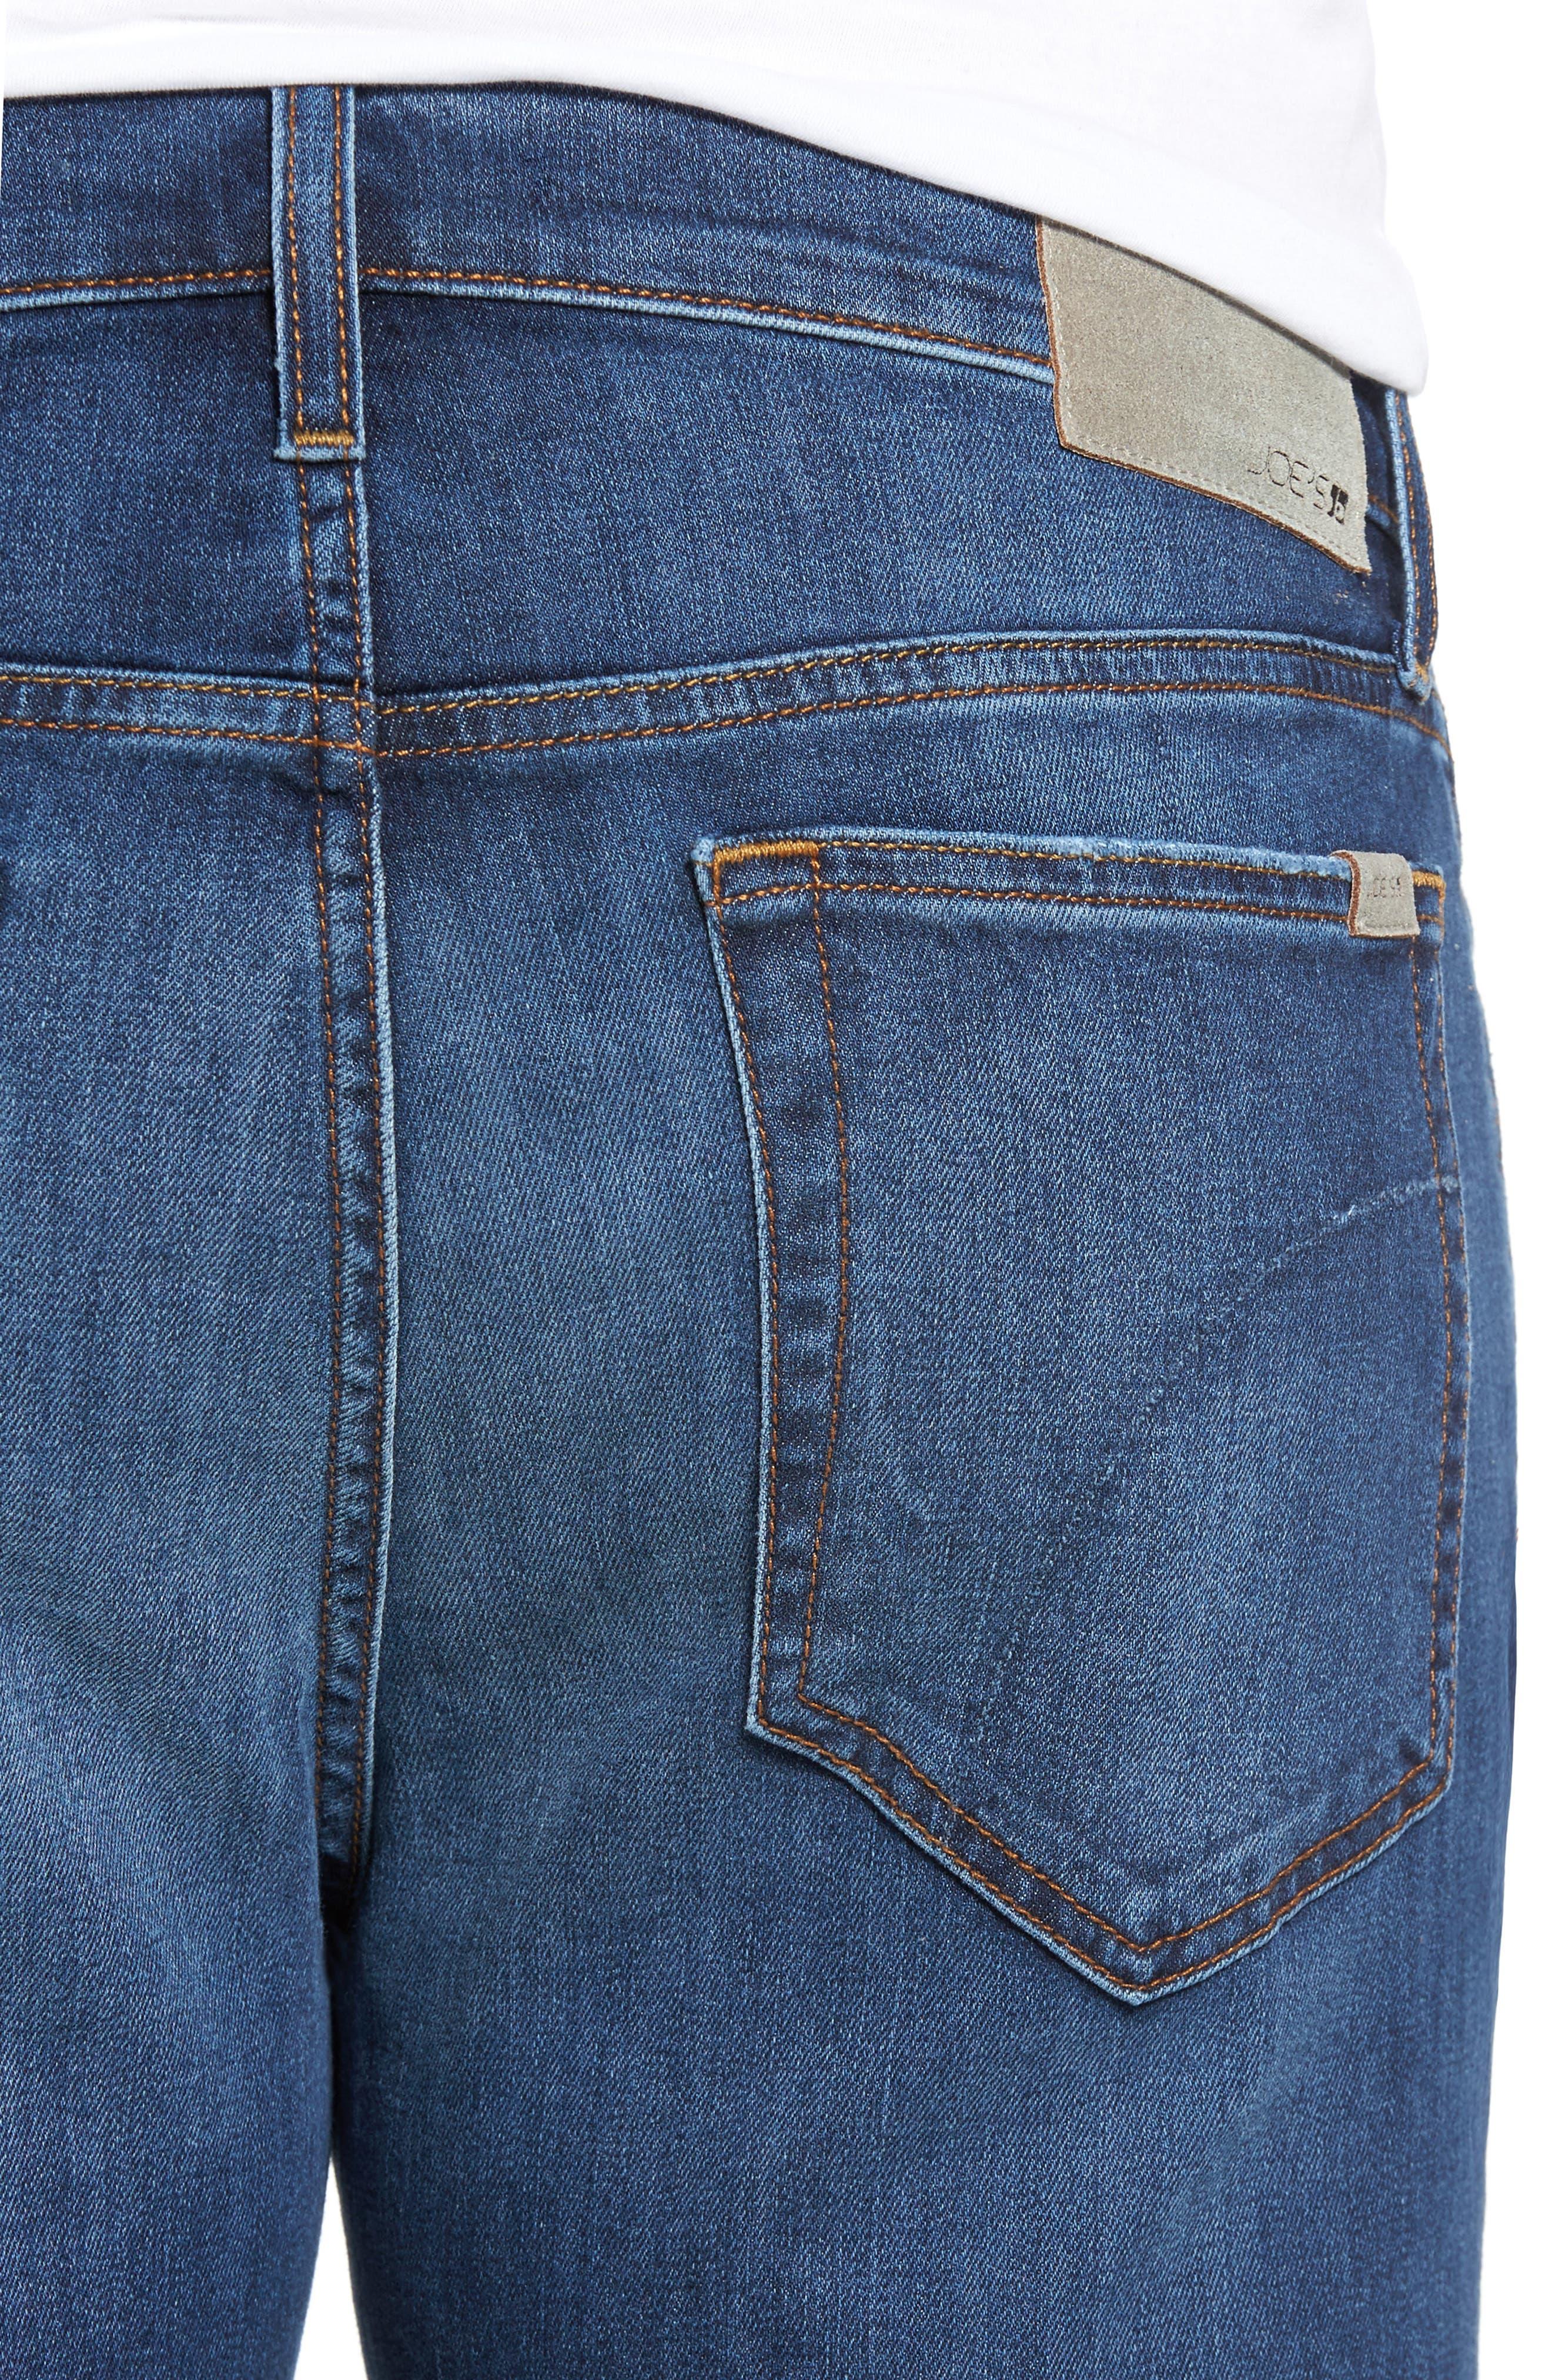 Classic Straight Leg Jeans,                             Alternate thumbnail 4, color,                             410